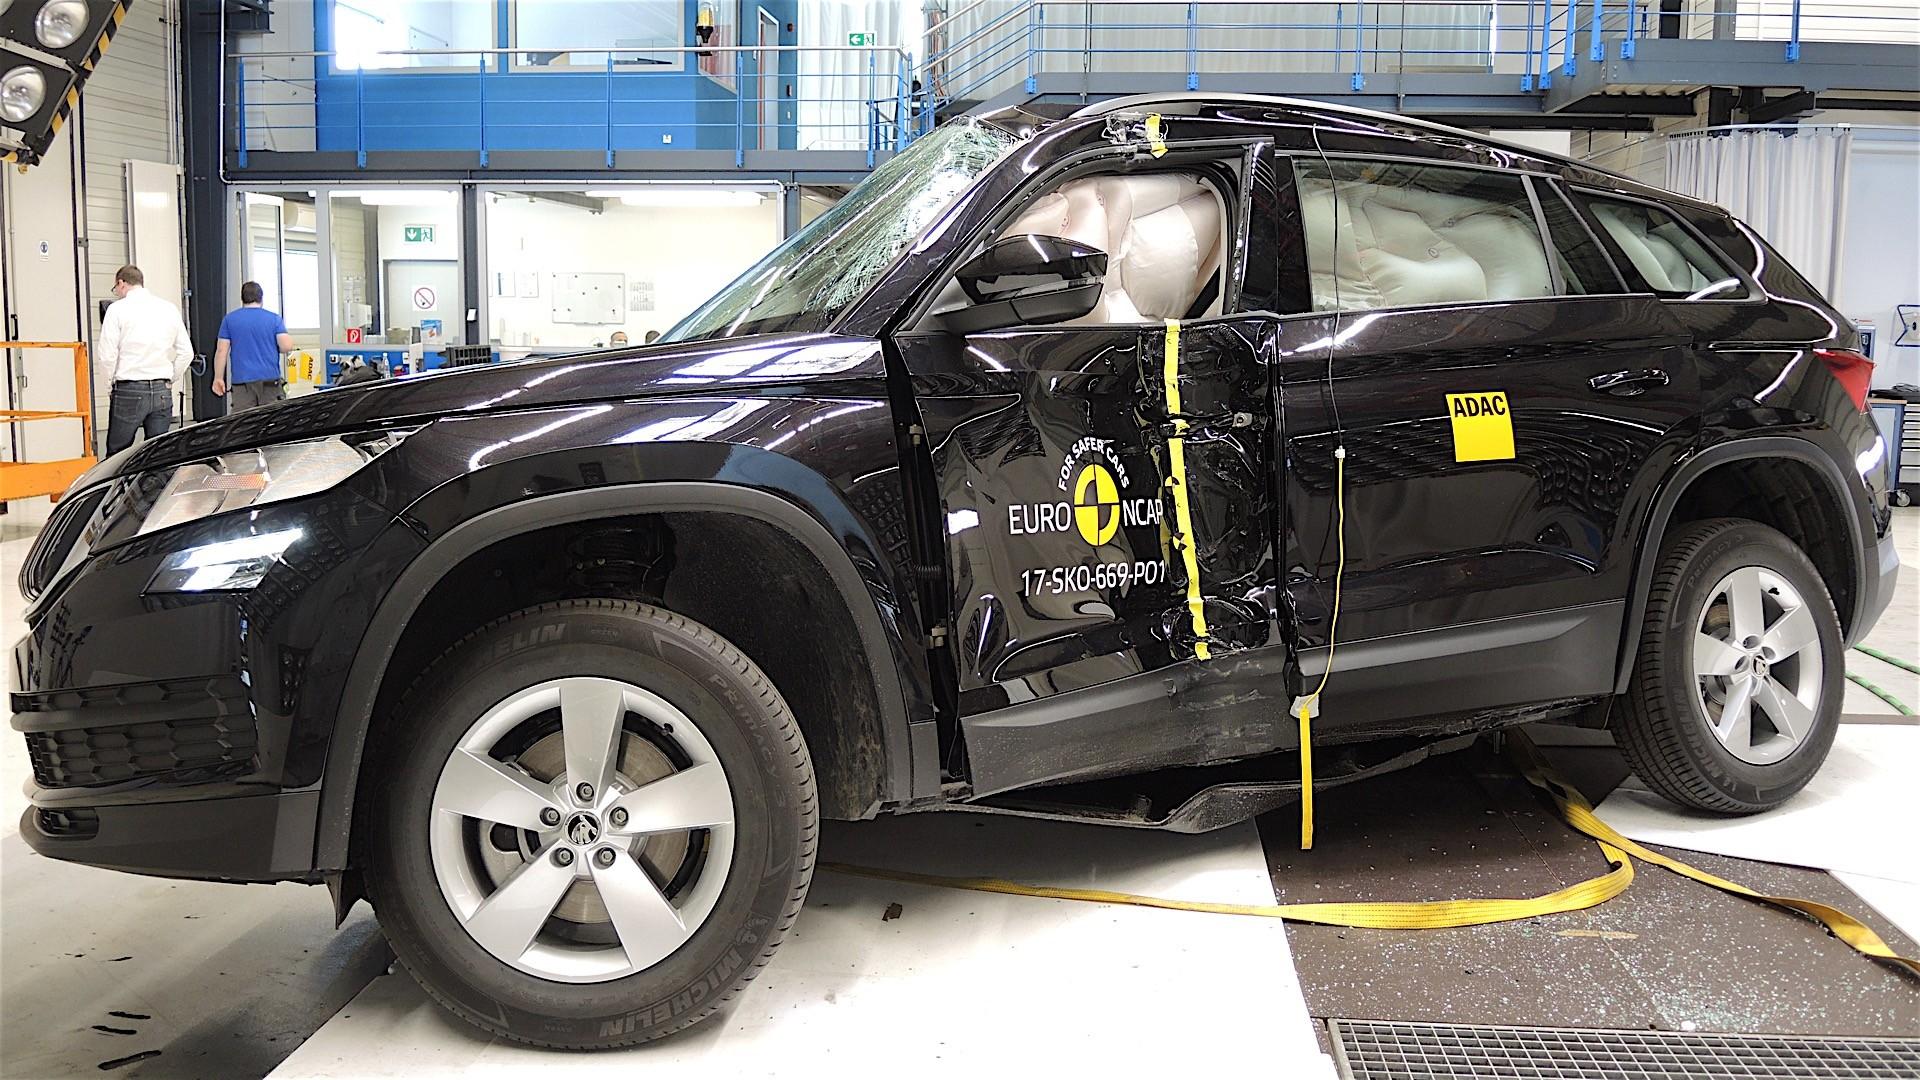 Euro NCAP crash tests may 2017 (7)